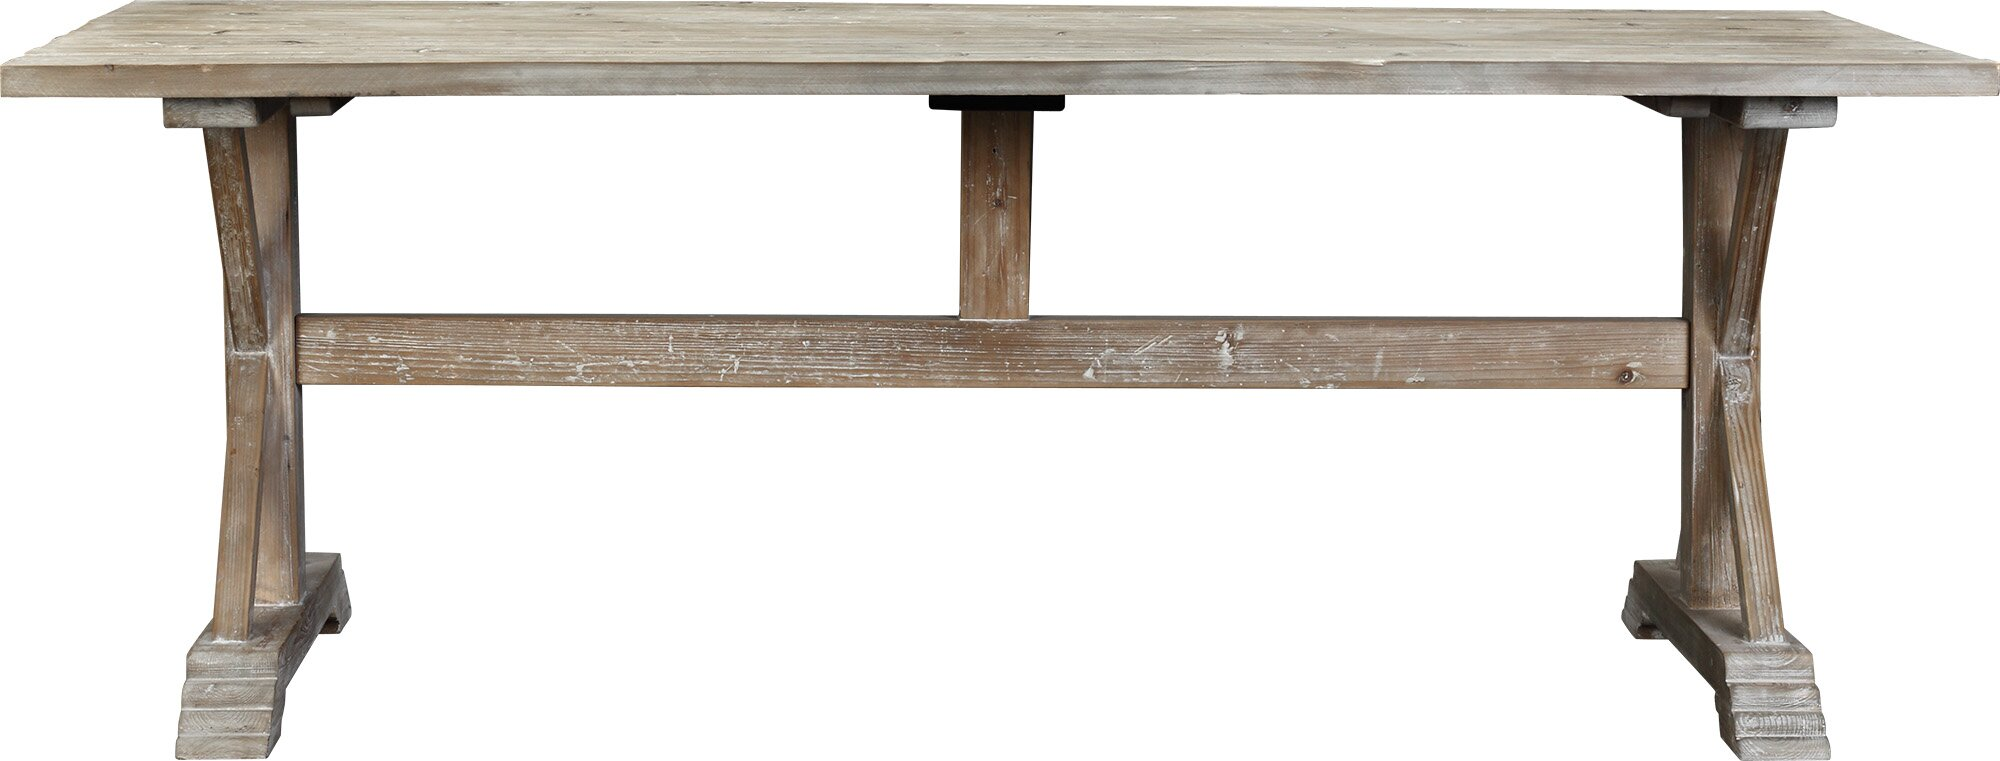 Reclaimed Pine Trestle Dining Table, Whitewashed